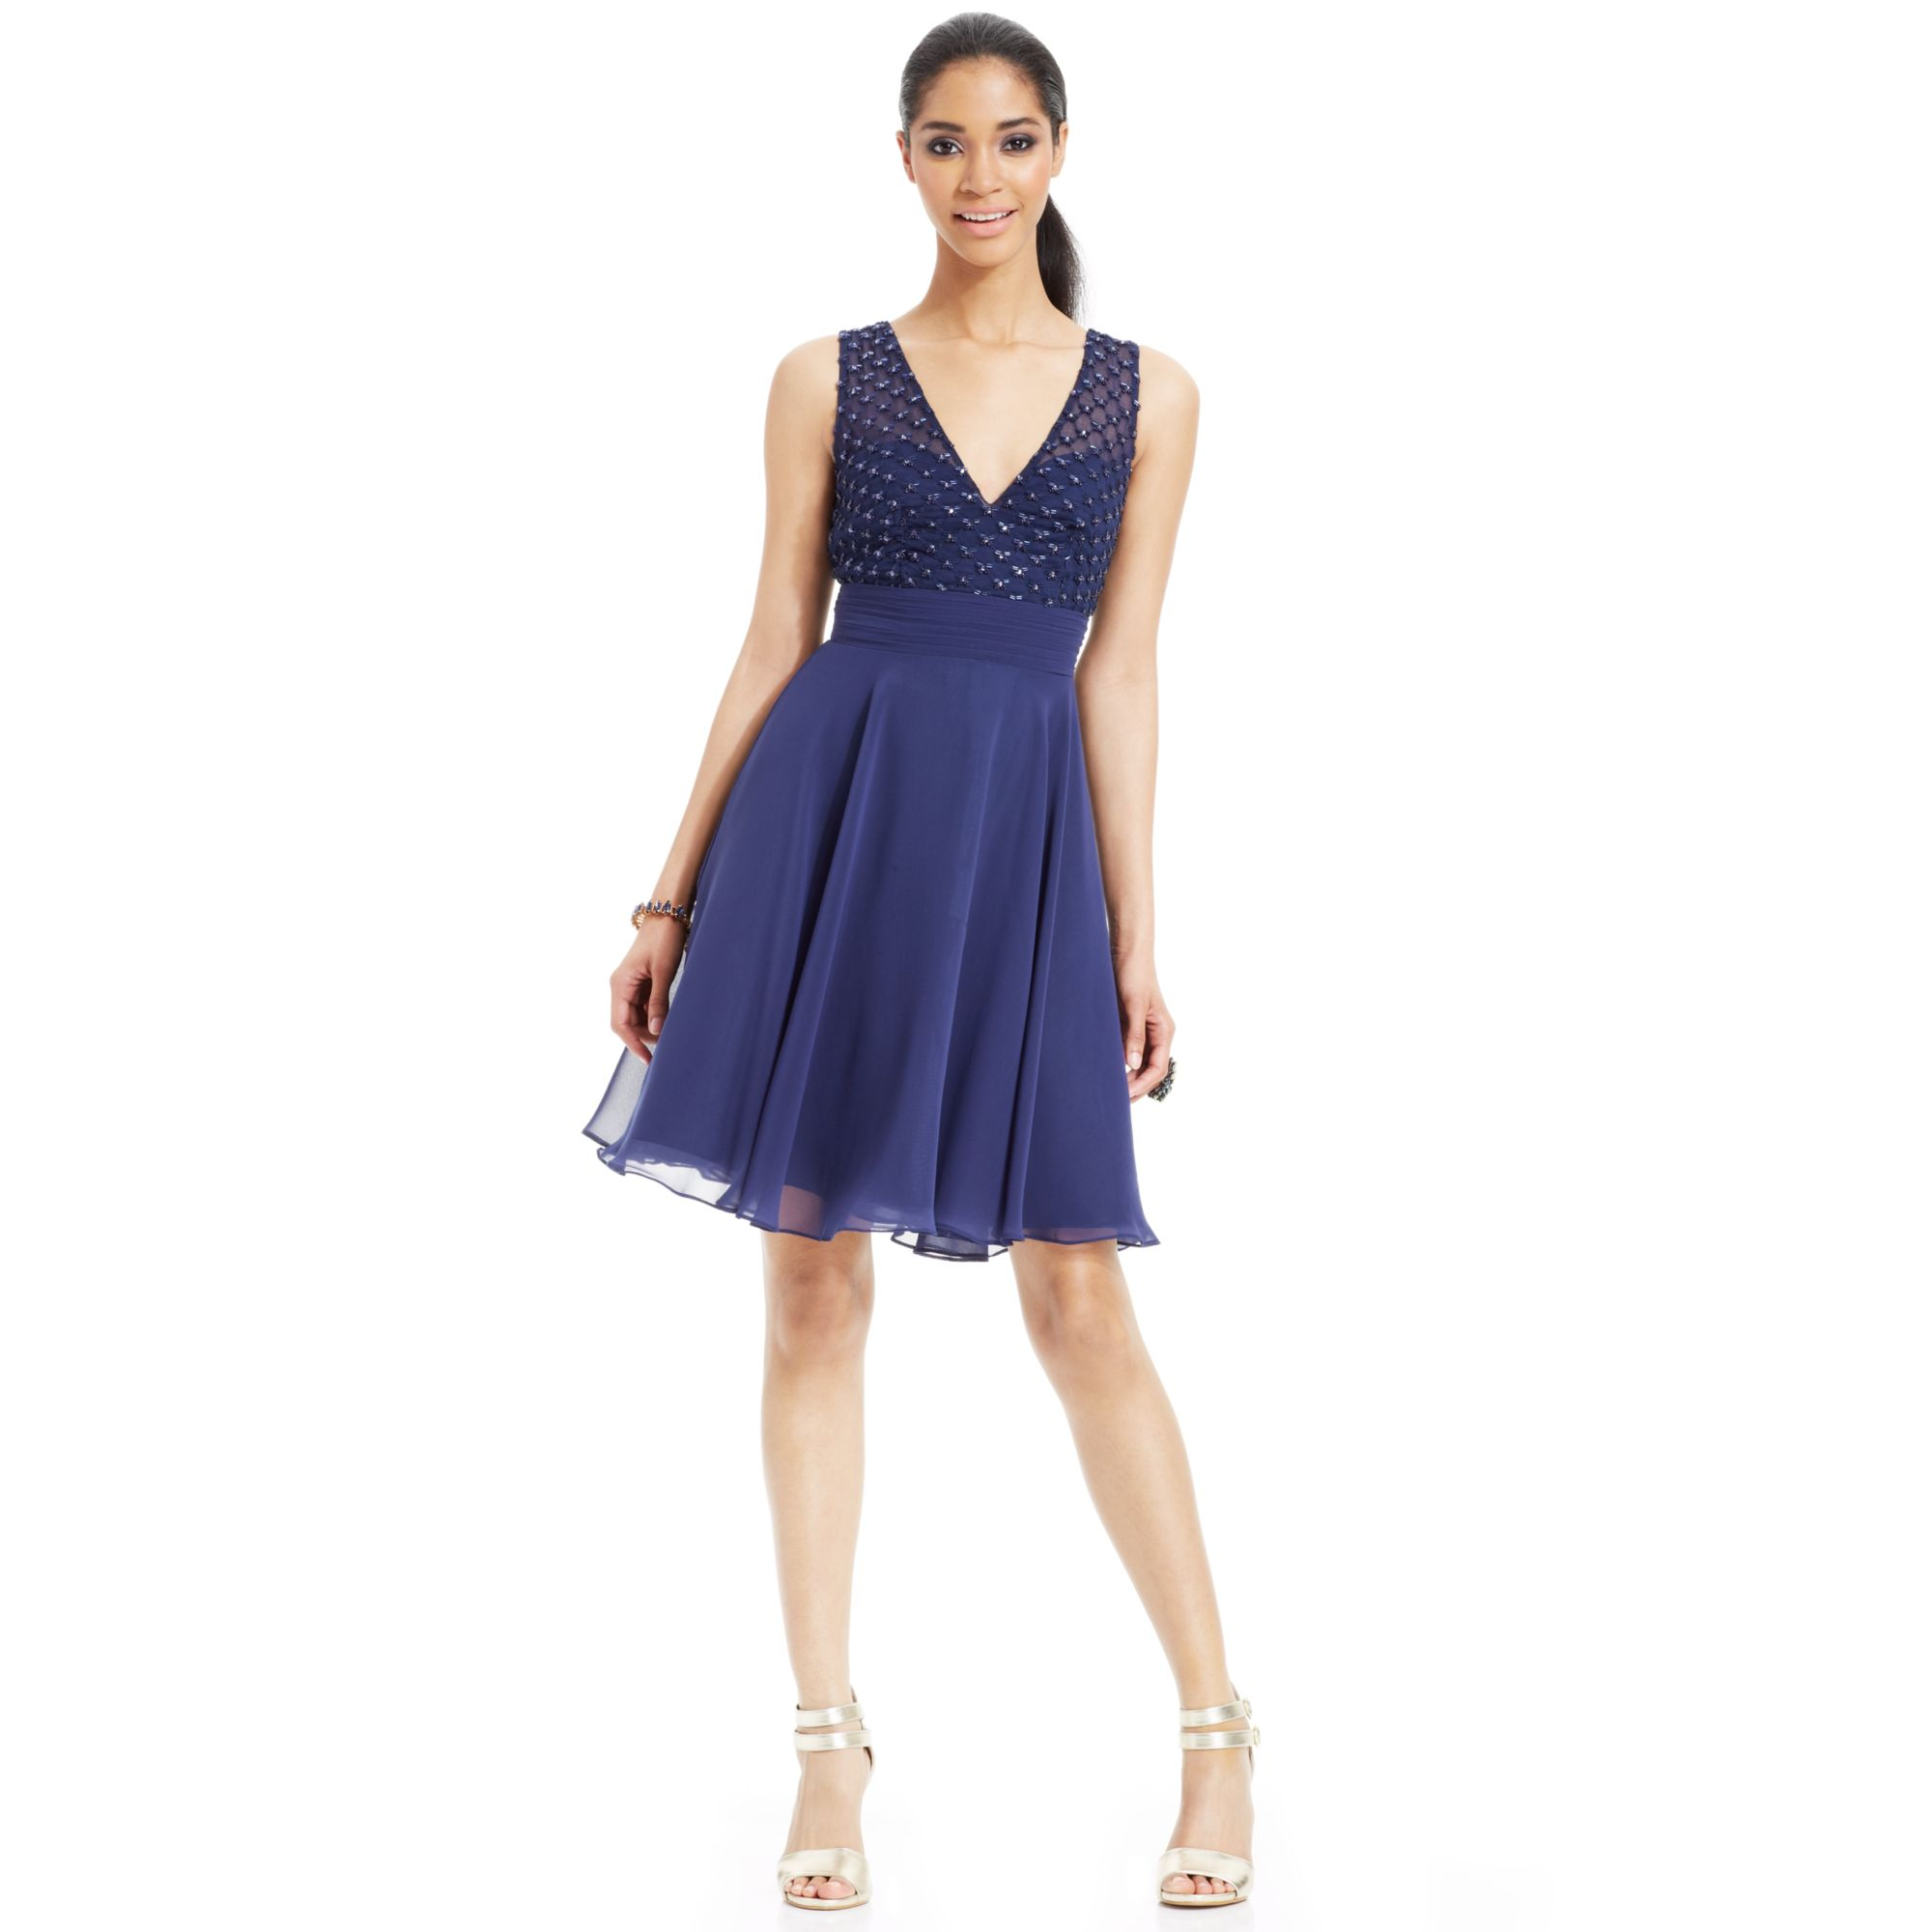 Lyst - Js Boutique Beaded Chiffon V-Neck Dress in Blue